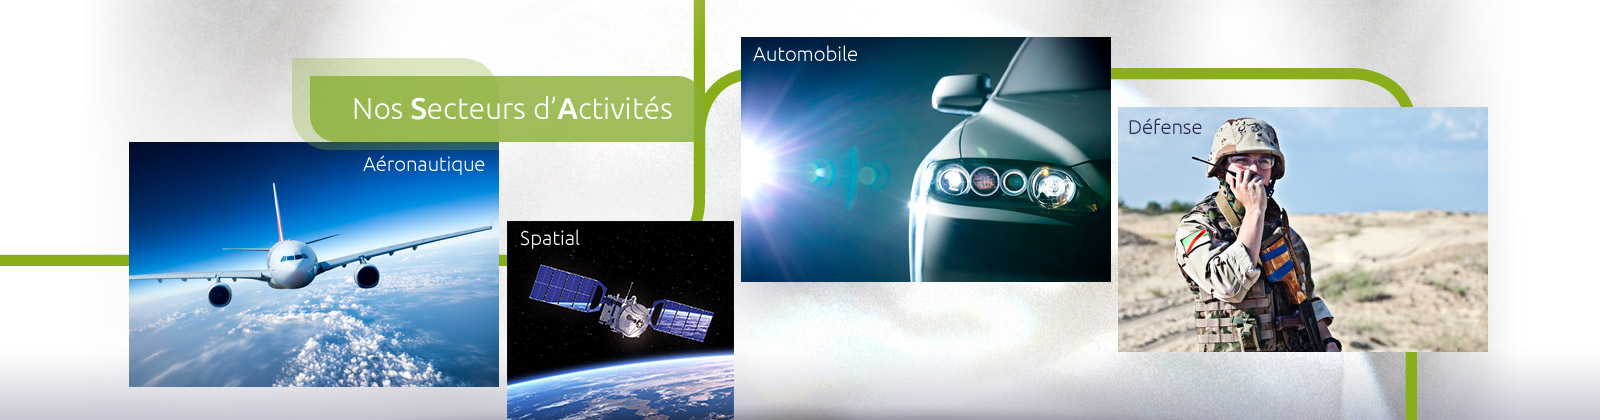 Galvanoplastie industrielle : Nos secteurs d'activités